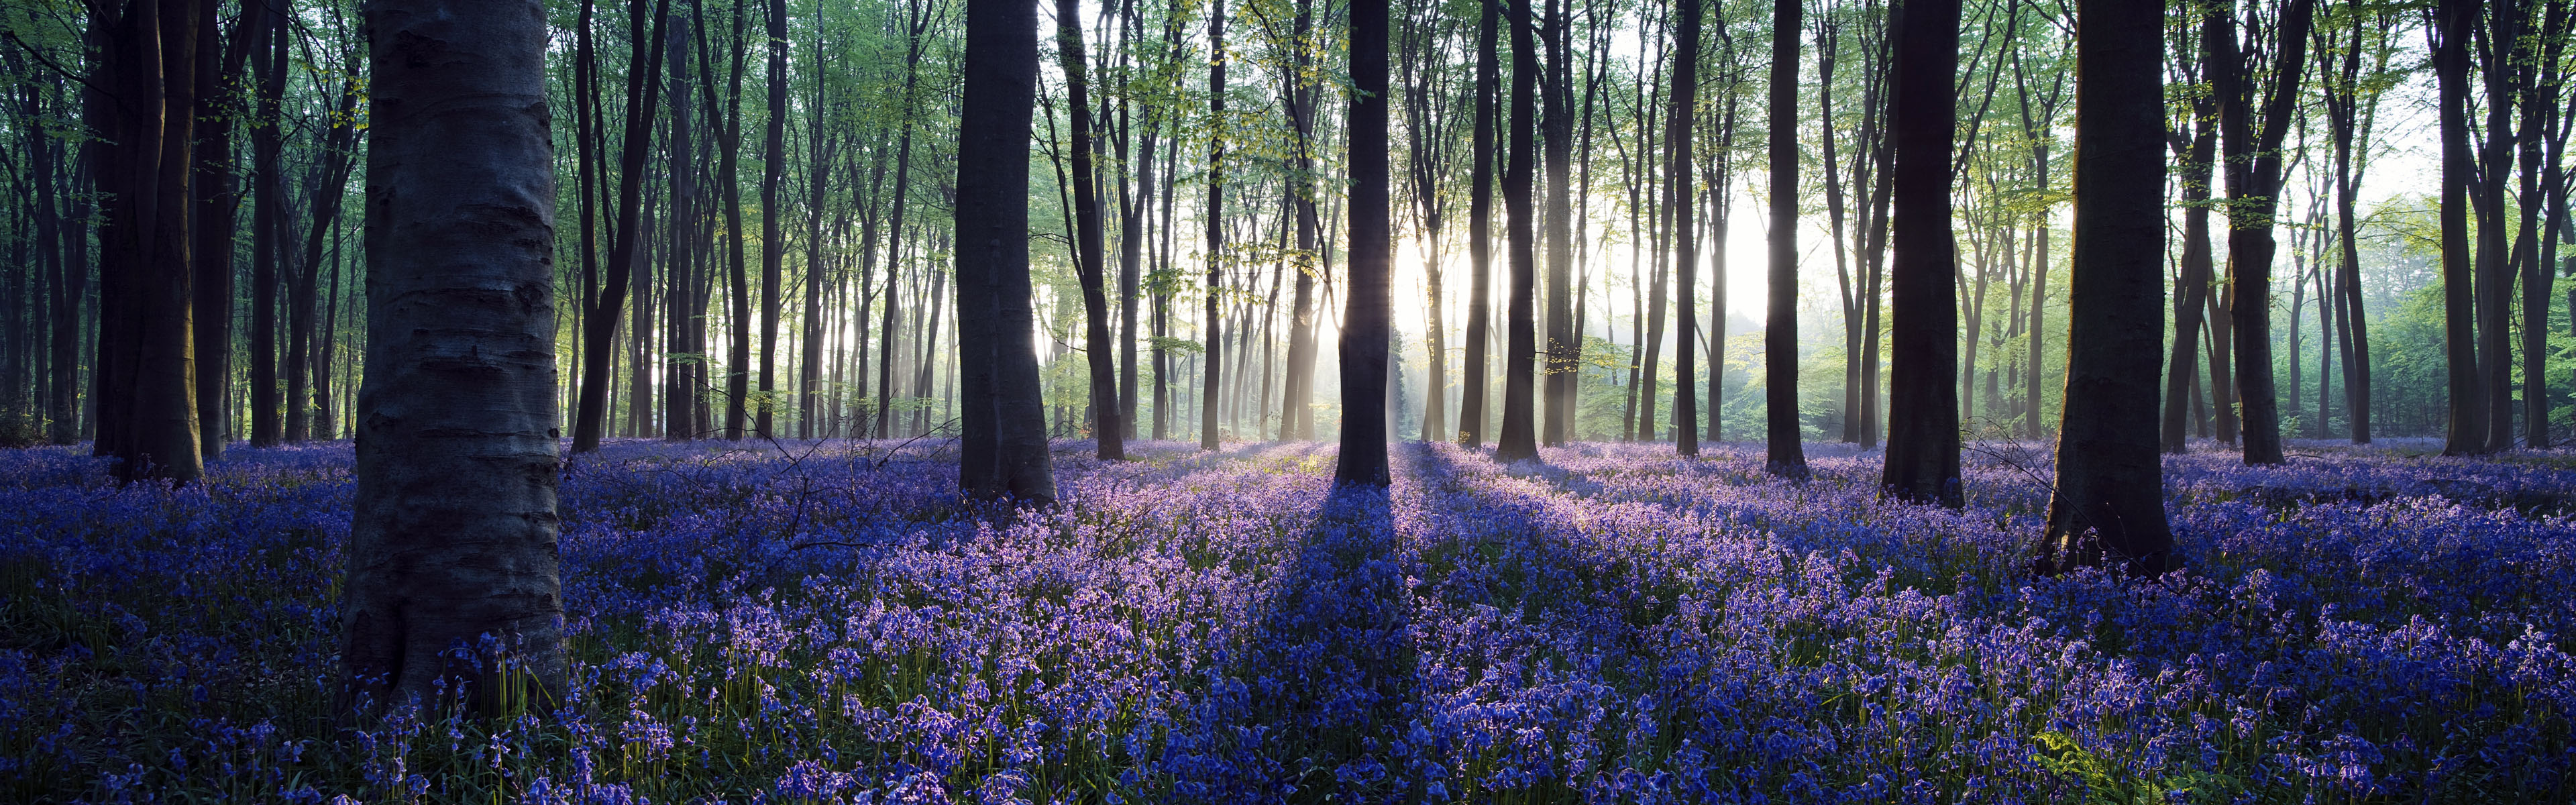 Dawn in bluebell woodland (Hyacinthoides non-scripta), Hampshire, England, U.K.